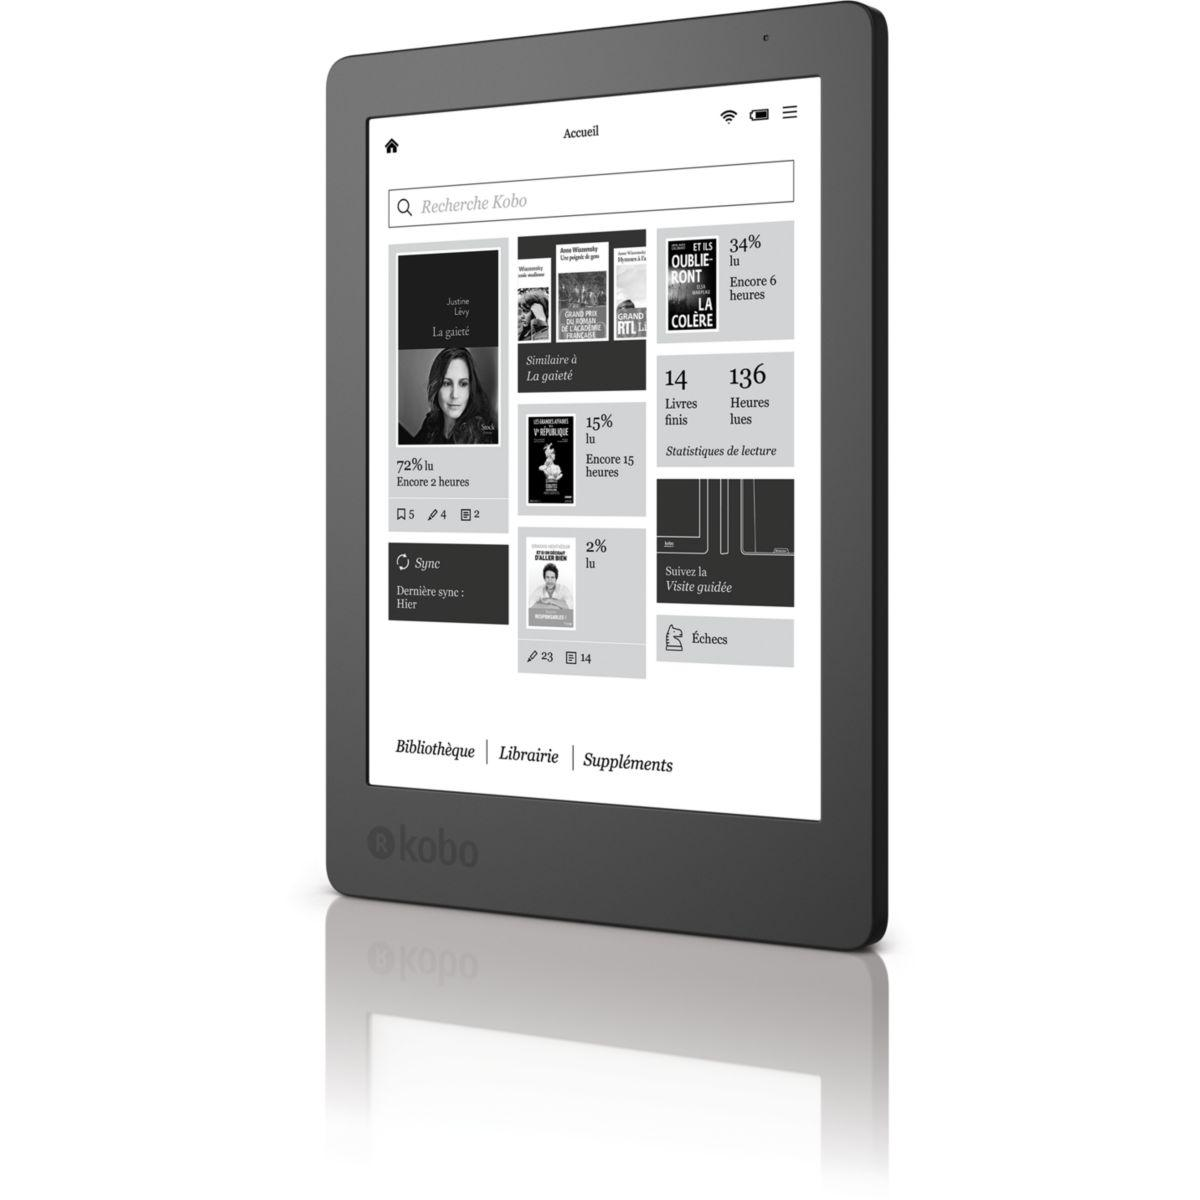 E-book kobo aura 2 - 2% de remise imm�diate avec le code : wd2 (photo)